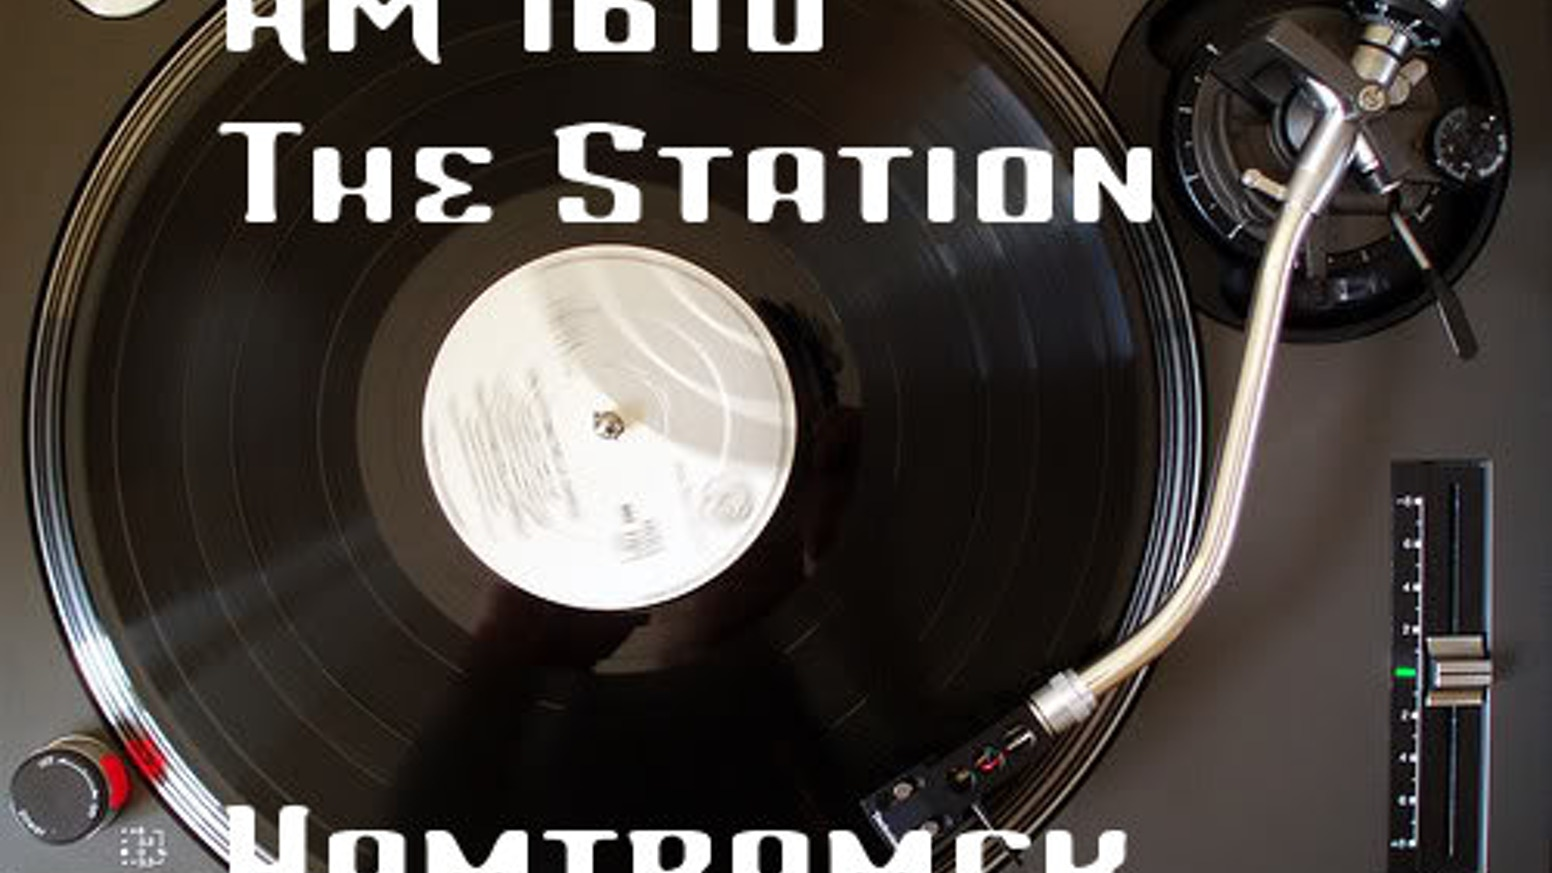 Am 1610 The Station Mission Michigan Vinyl Acquisition